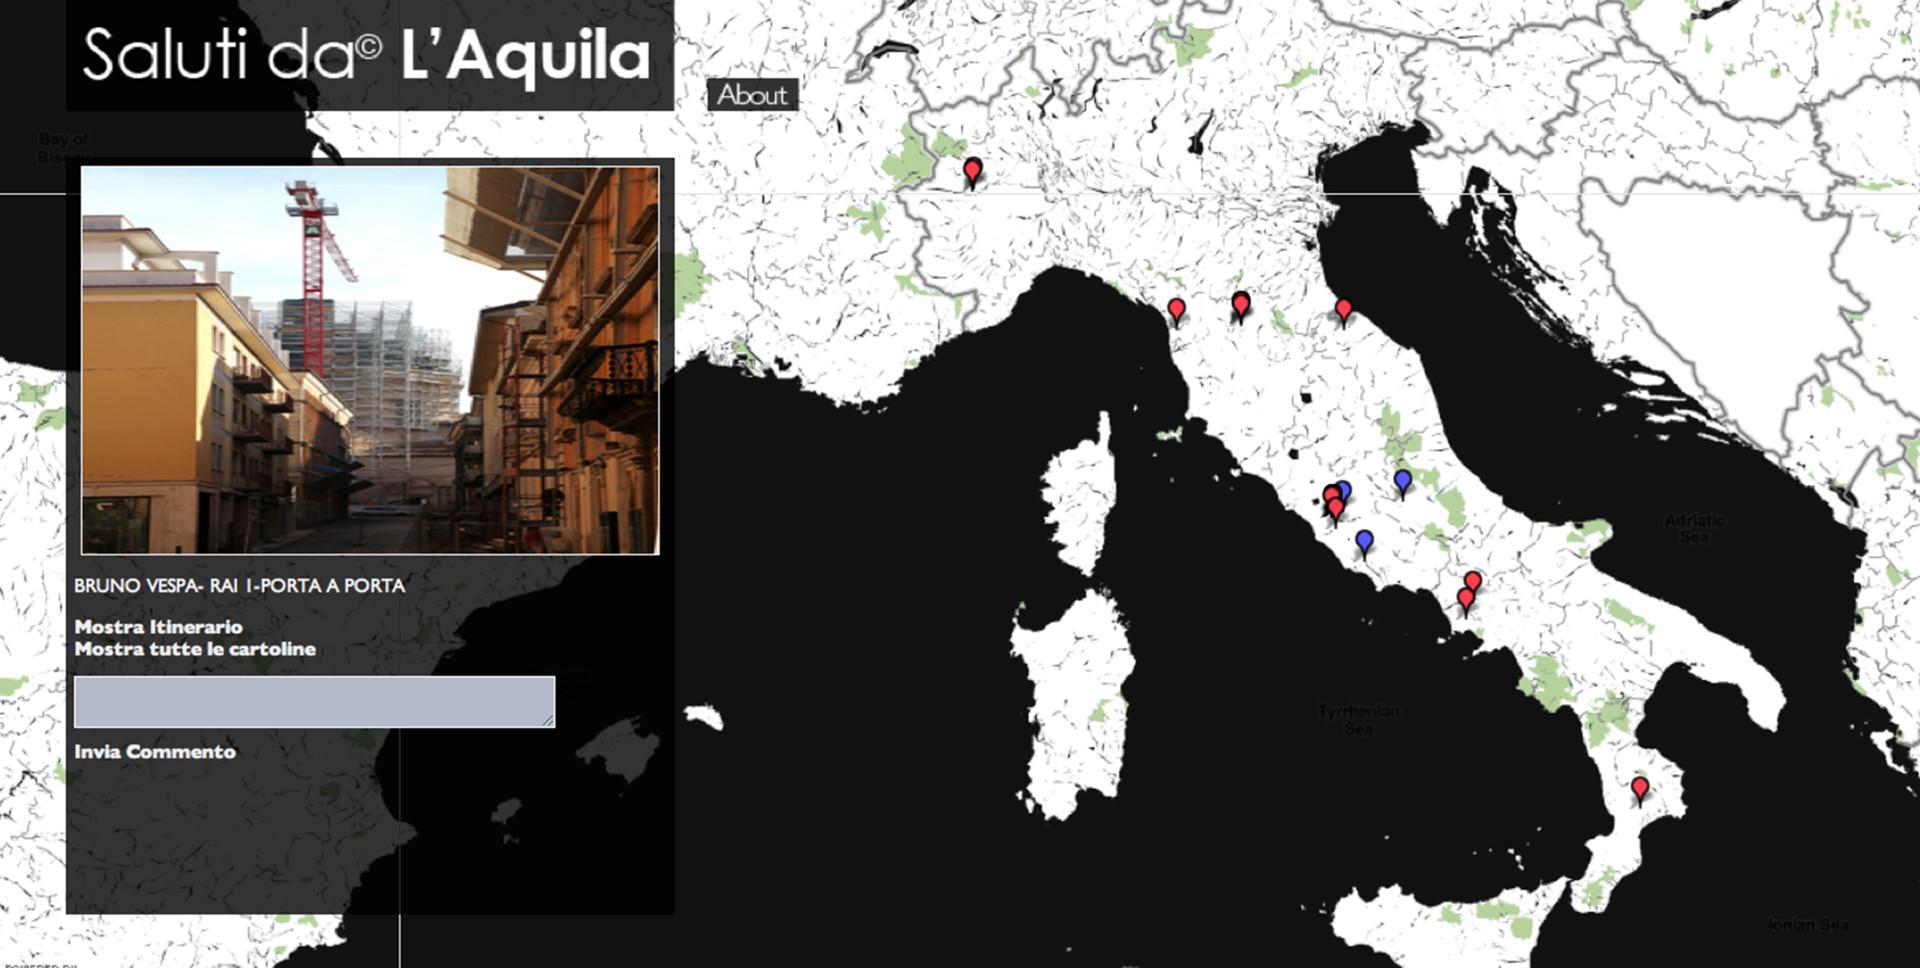 Saluti da L'Aquila schermata1_bassa